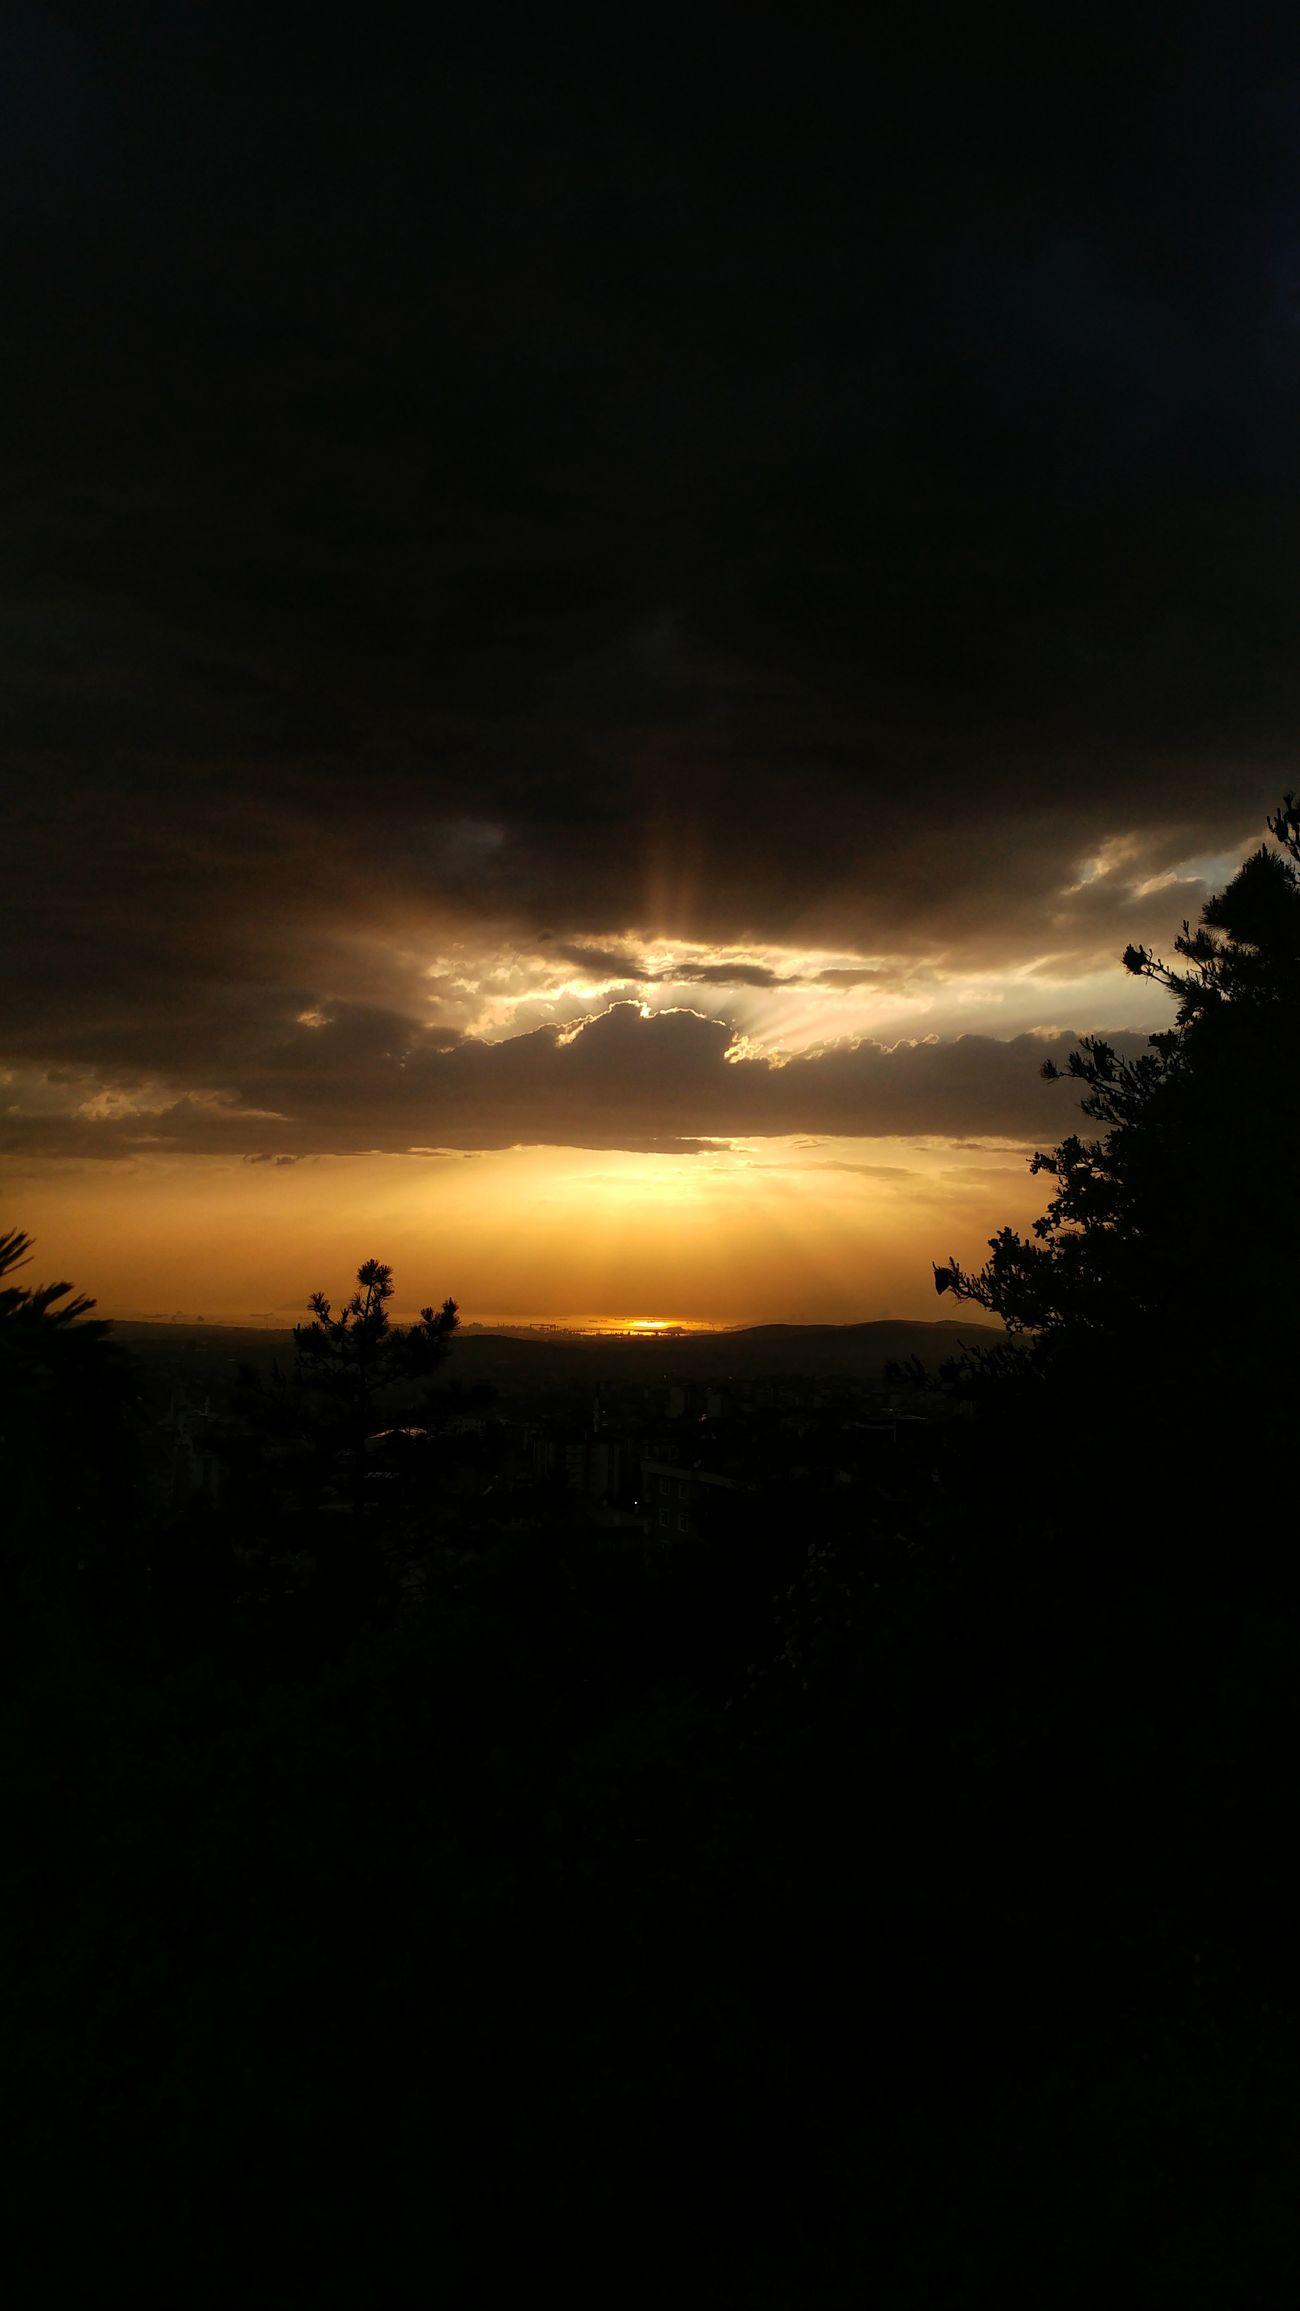 Sunset Silhouette Tree Dramatic Sky Dark Cloud - Sky Sky Landscape No People Night Nature Scenics Outdoors Forest Tree Area Beauty In Nature City Sehir Bulutlar Gunes Bulut Gunbatimi Manzara Day Dağ